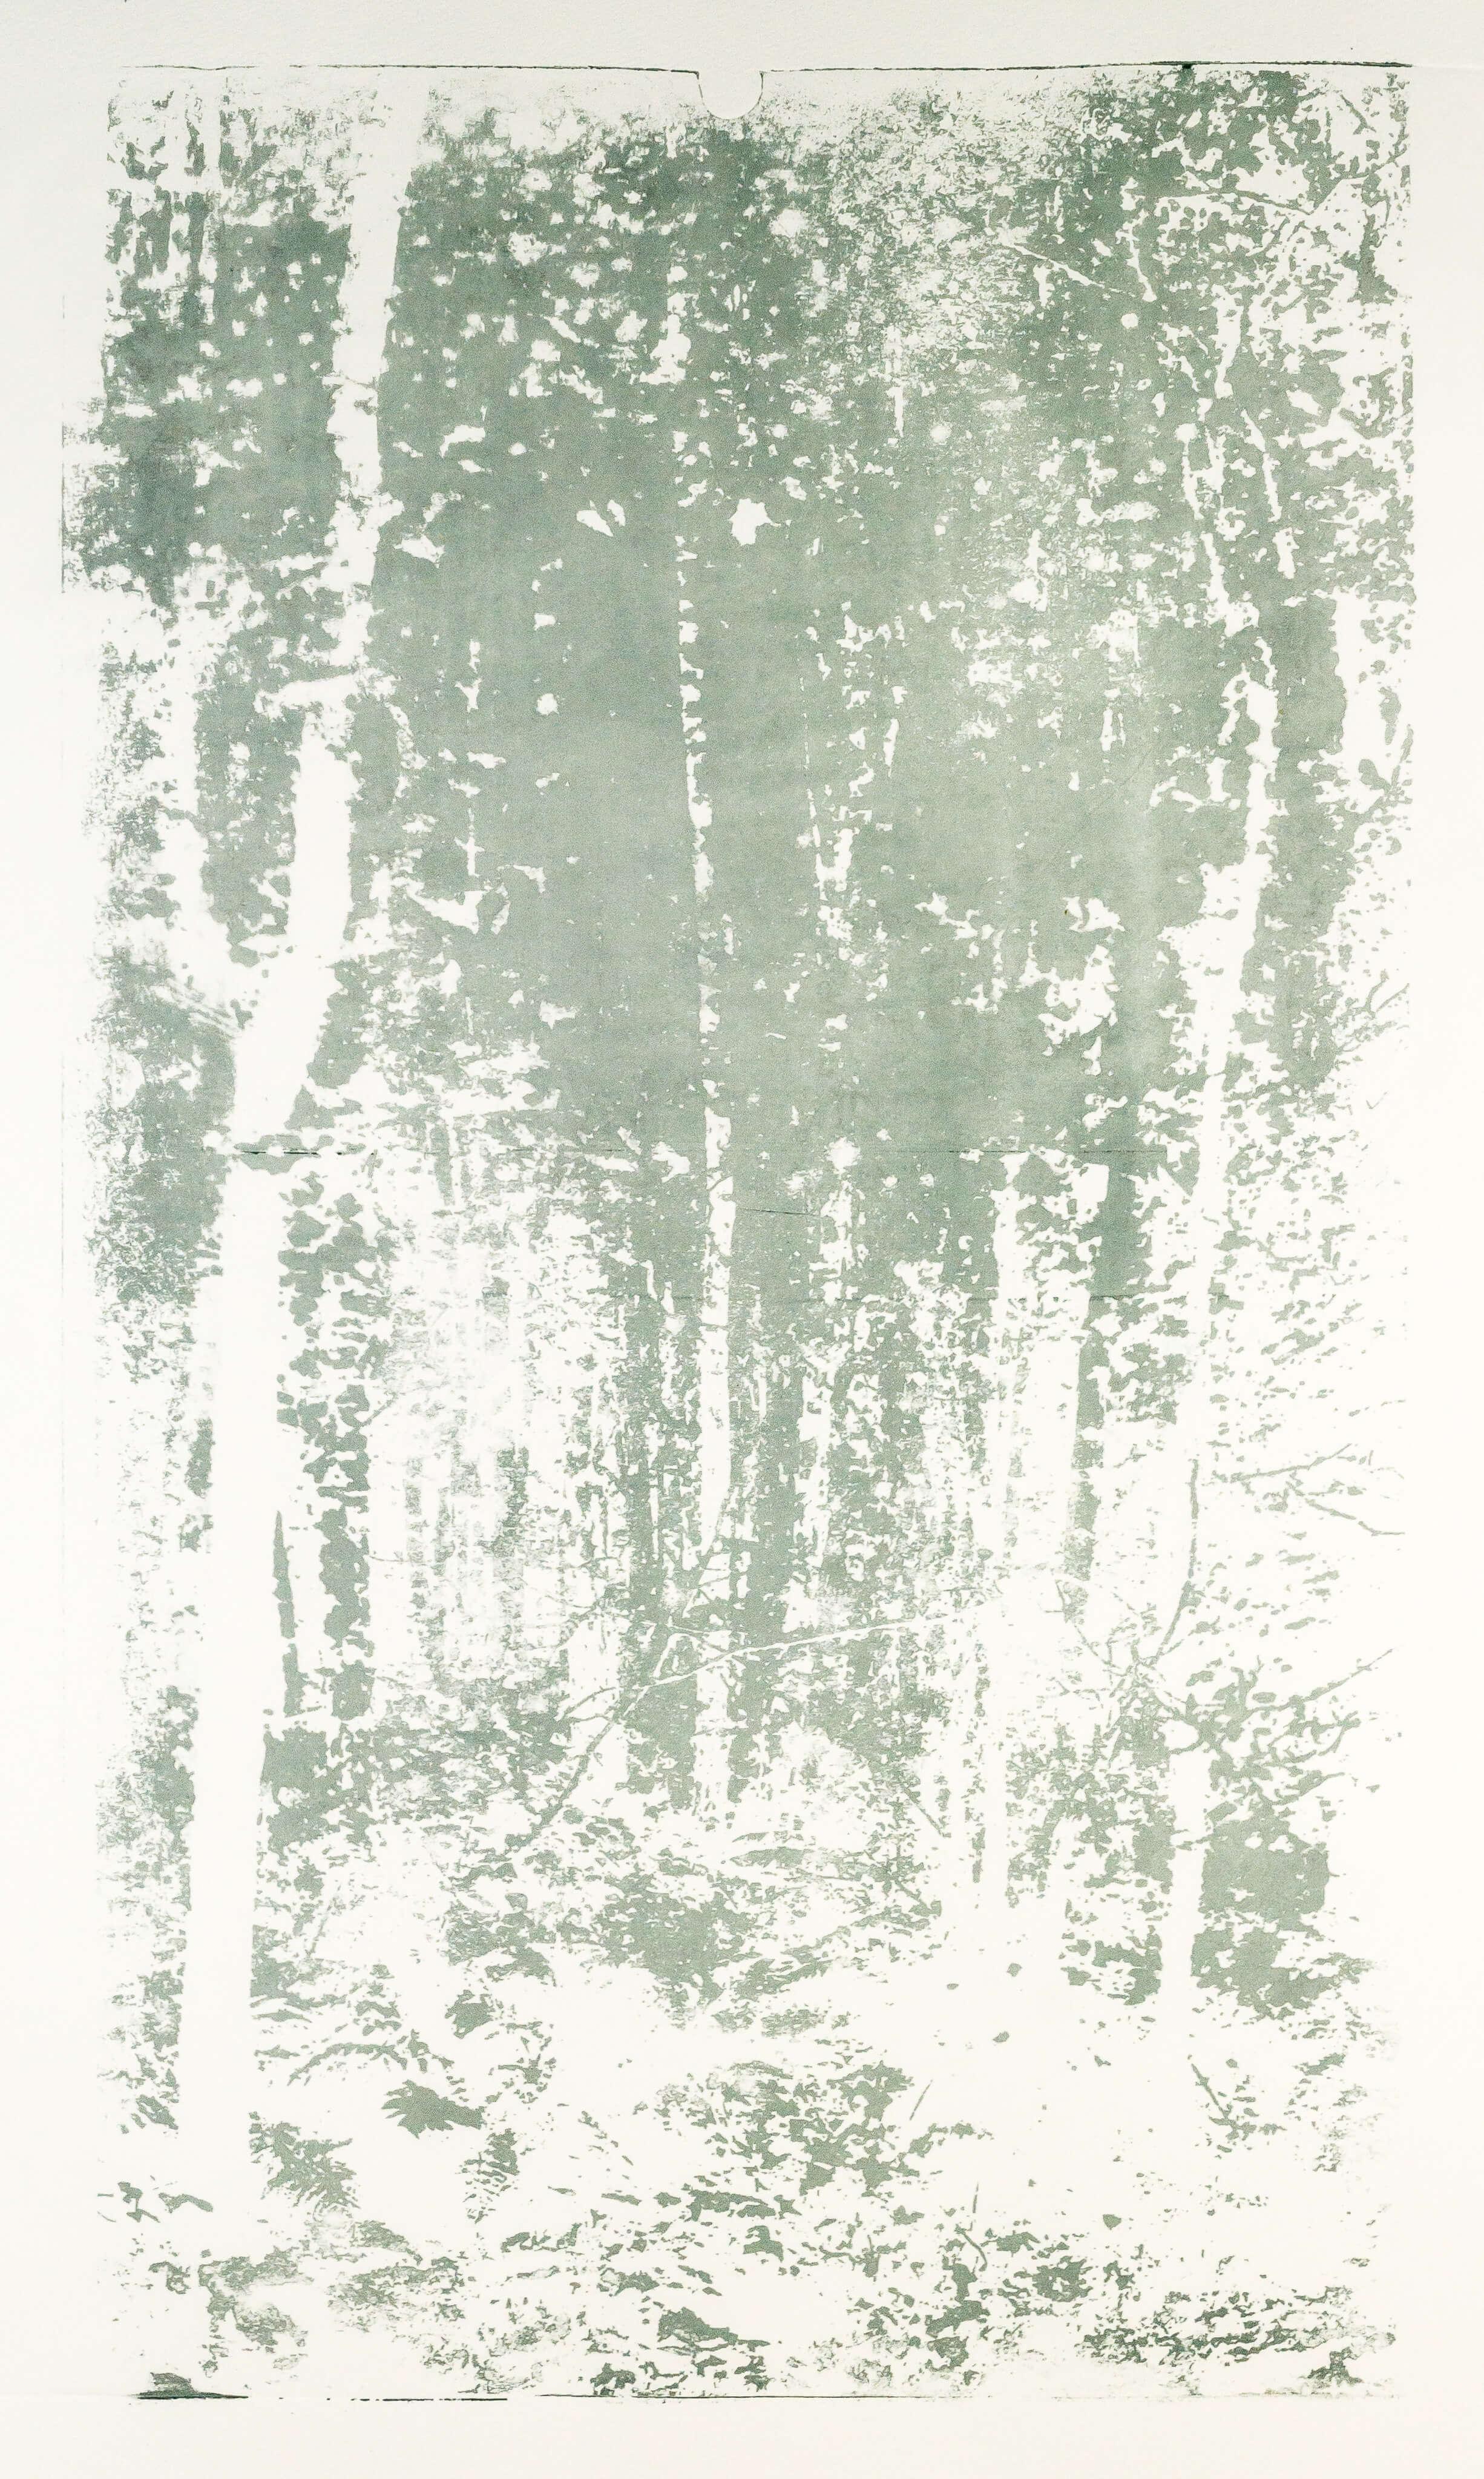 Katharina Albers, Wald XX.I-III, 2015, Farblithographie, Unikat, 60×33 cm